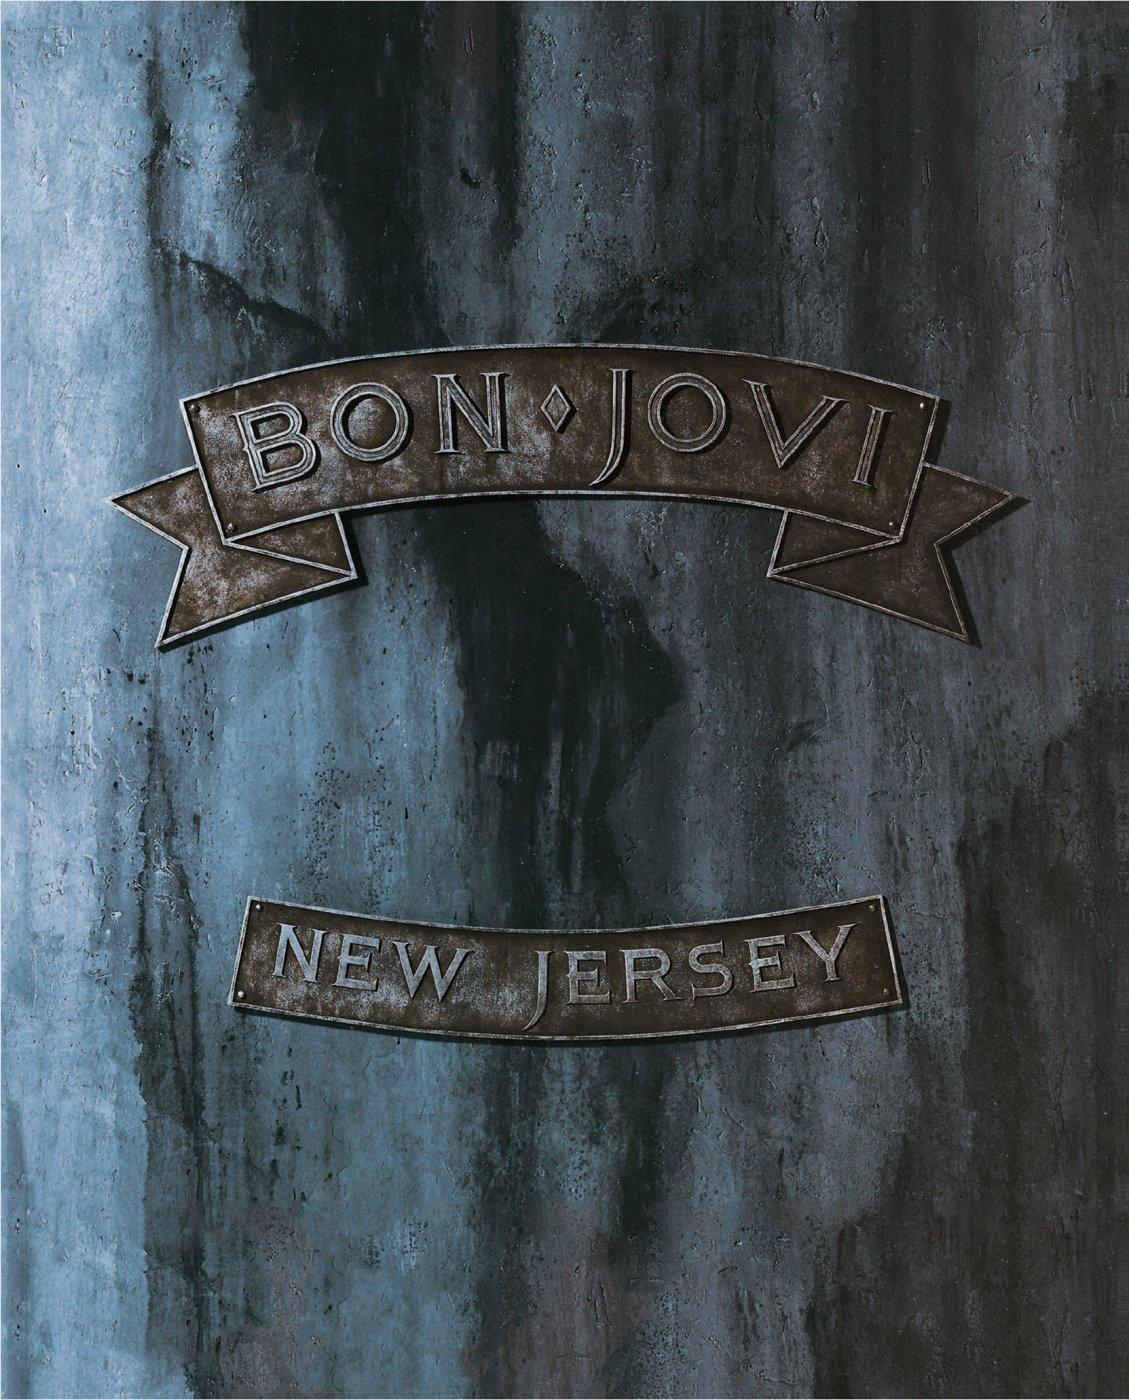 Bon Jovi - New Jersey (Deluxe Edition w/DVD) - CD